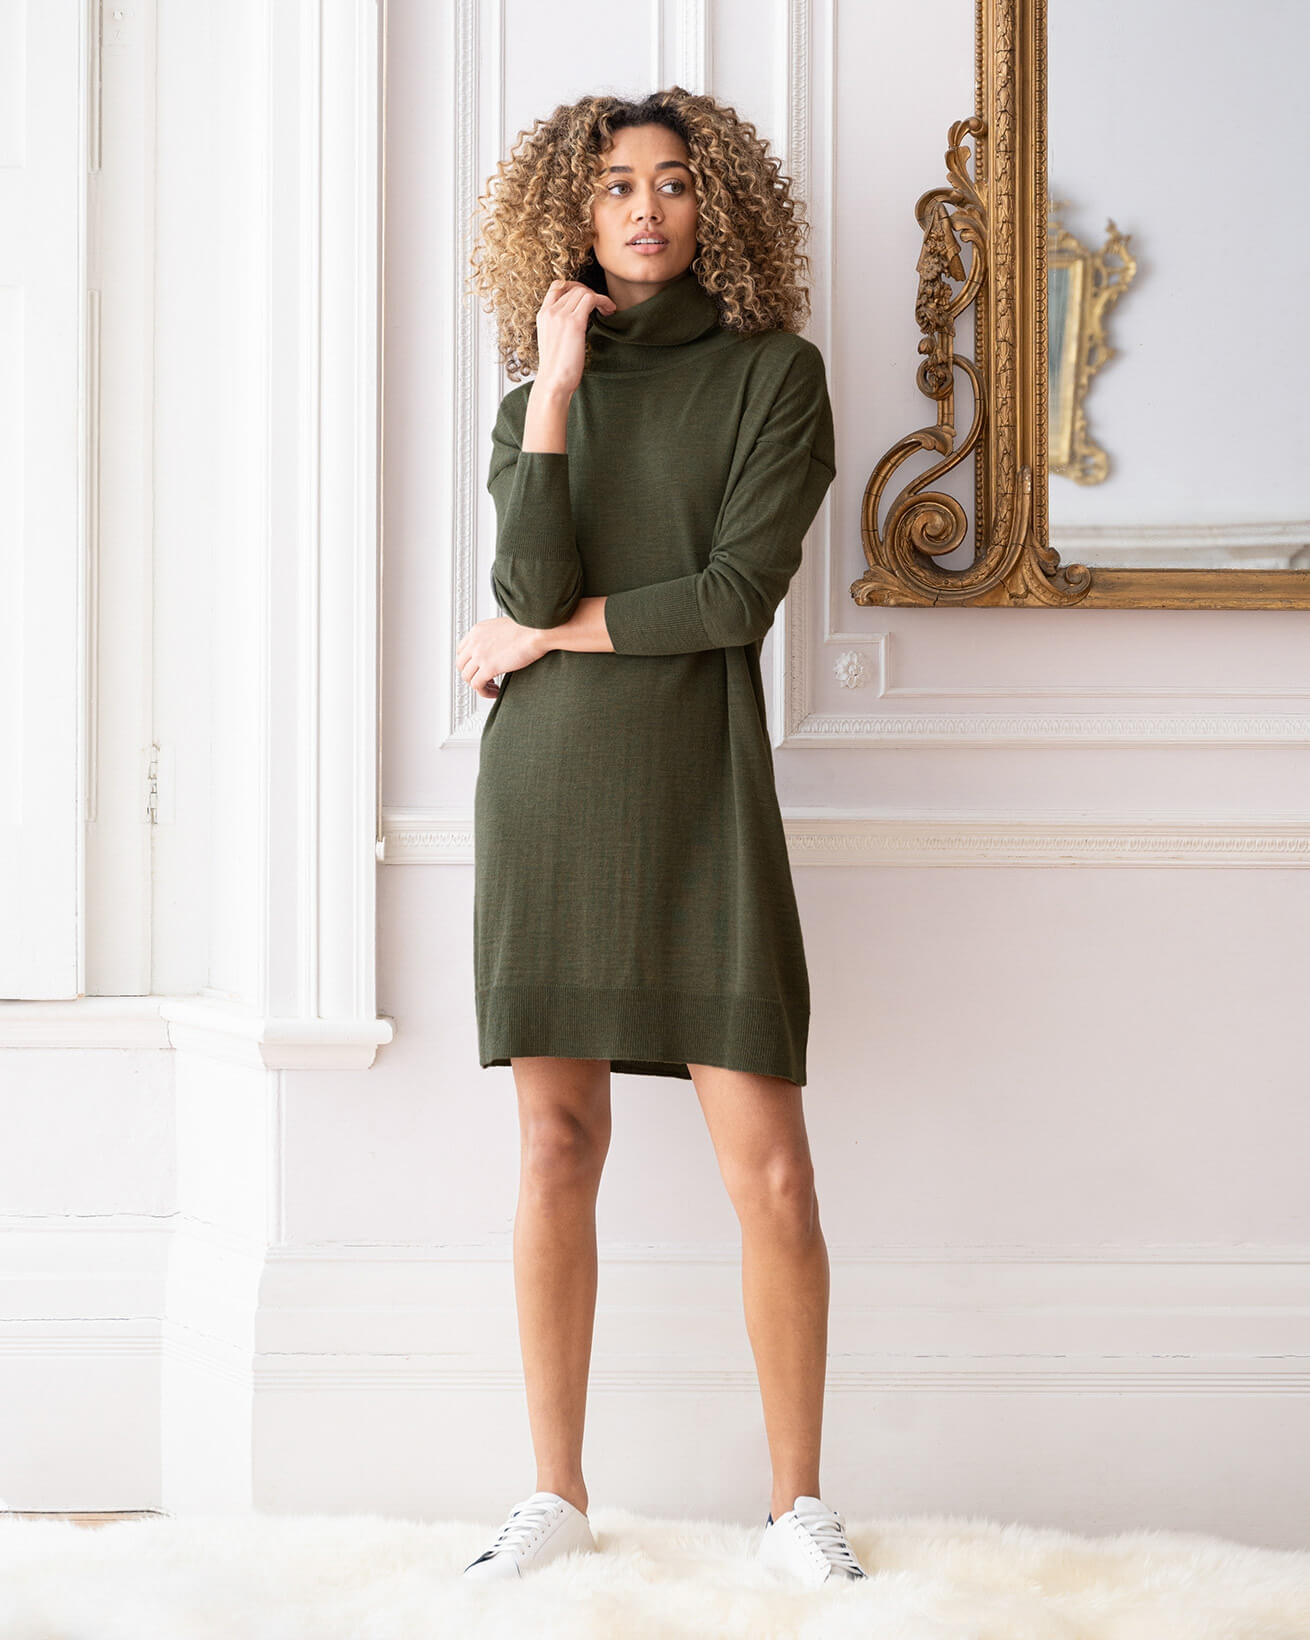 7515-7835_slouchy-fine-knit-roll-neck-dress_dark-moss-savannah-24_full-length_web.jpg